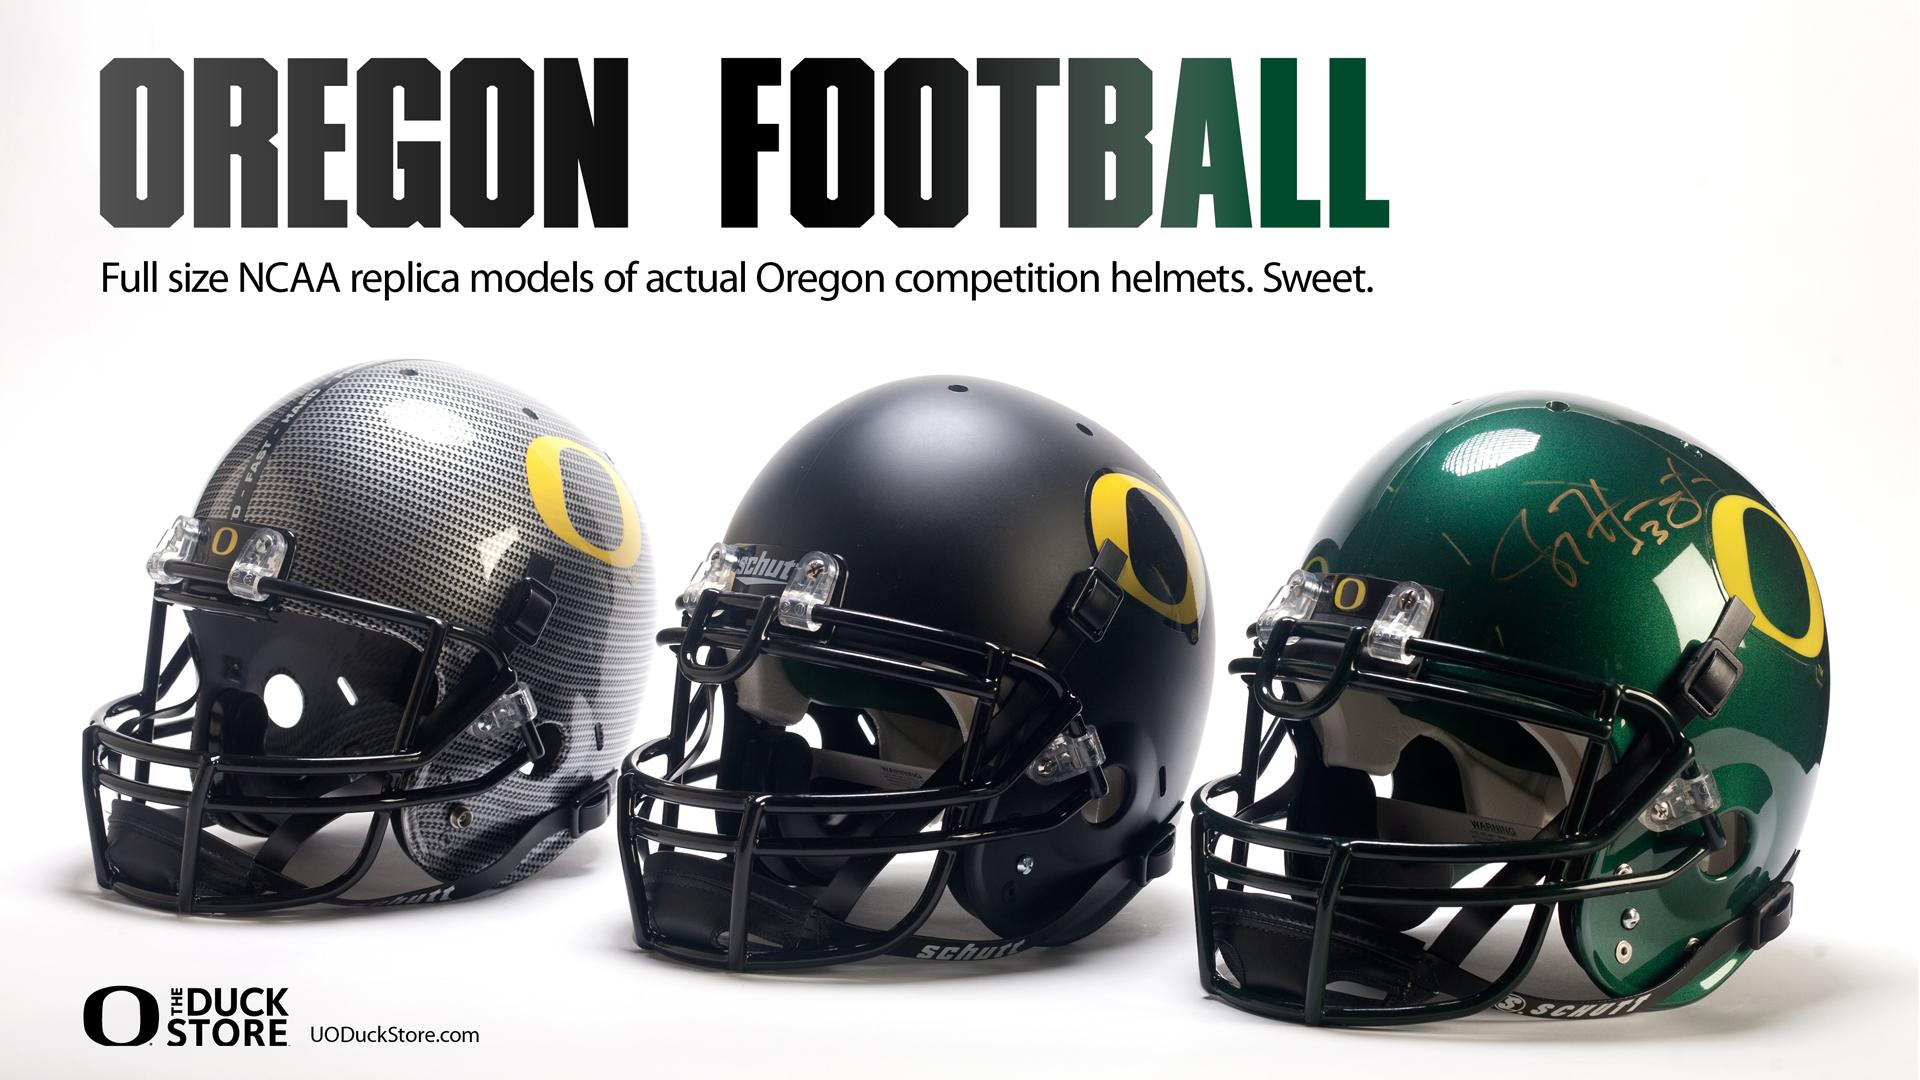 wallpapers ducks wallpaper oregon helmets football images 1920x1080